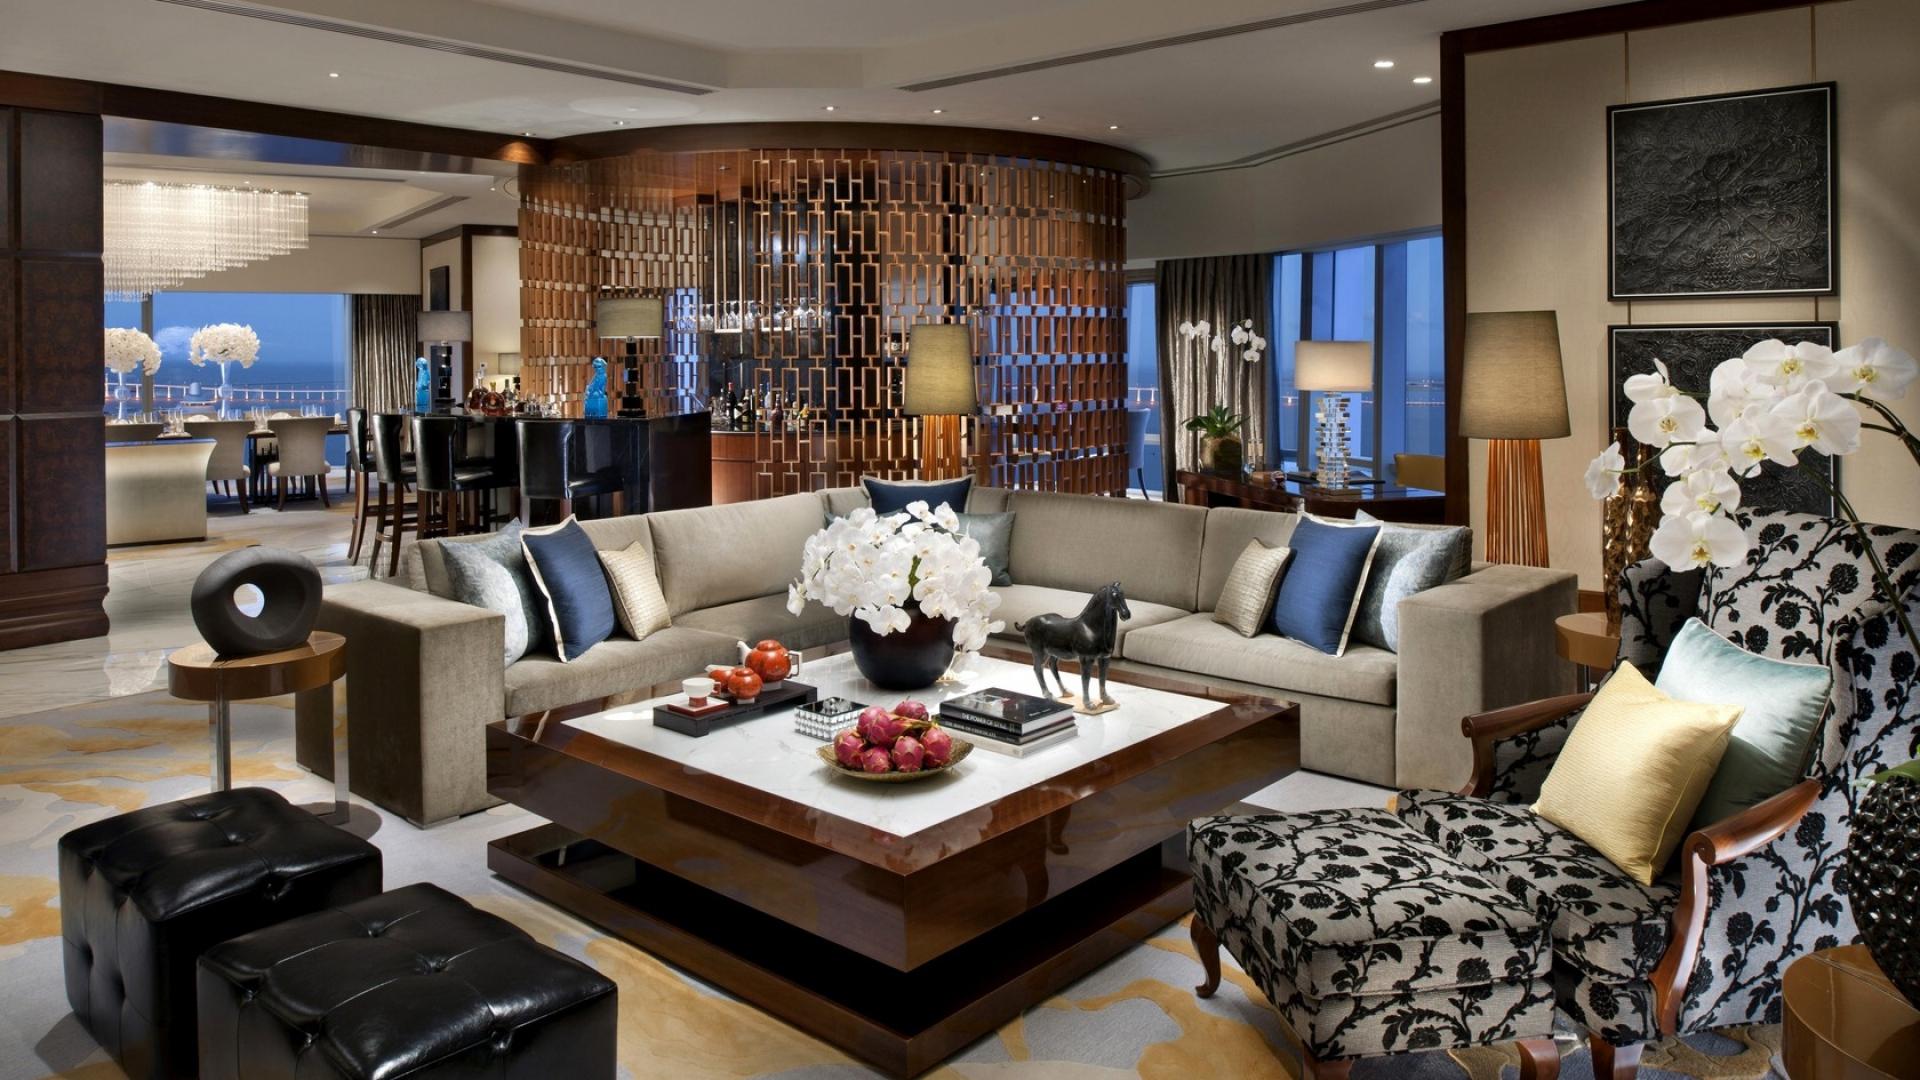 Download wallpaper 1920x1080 room interior design for Comfort room interior designs